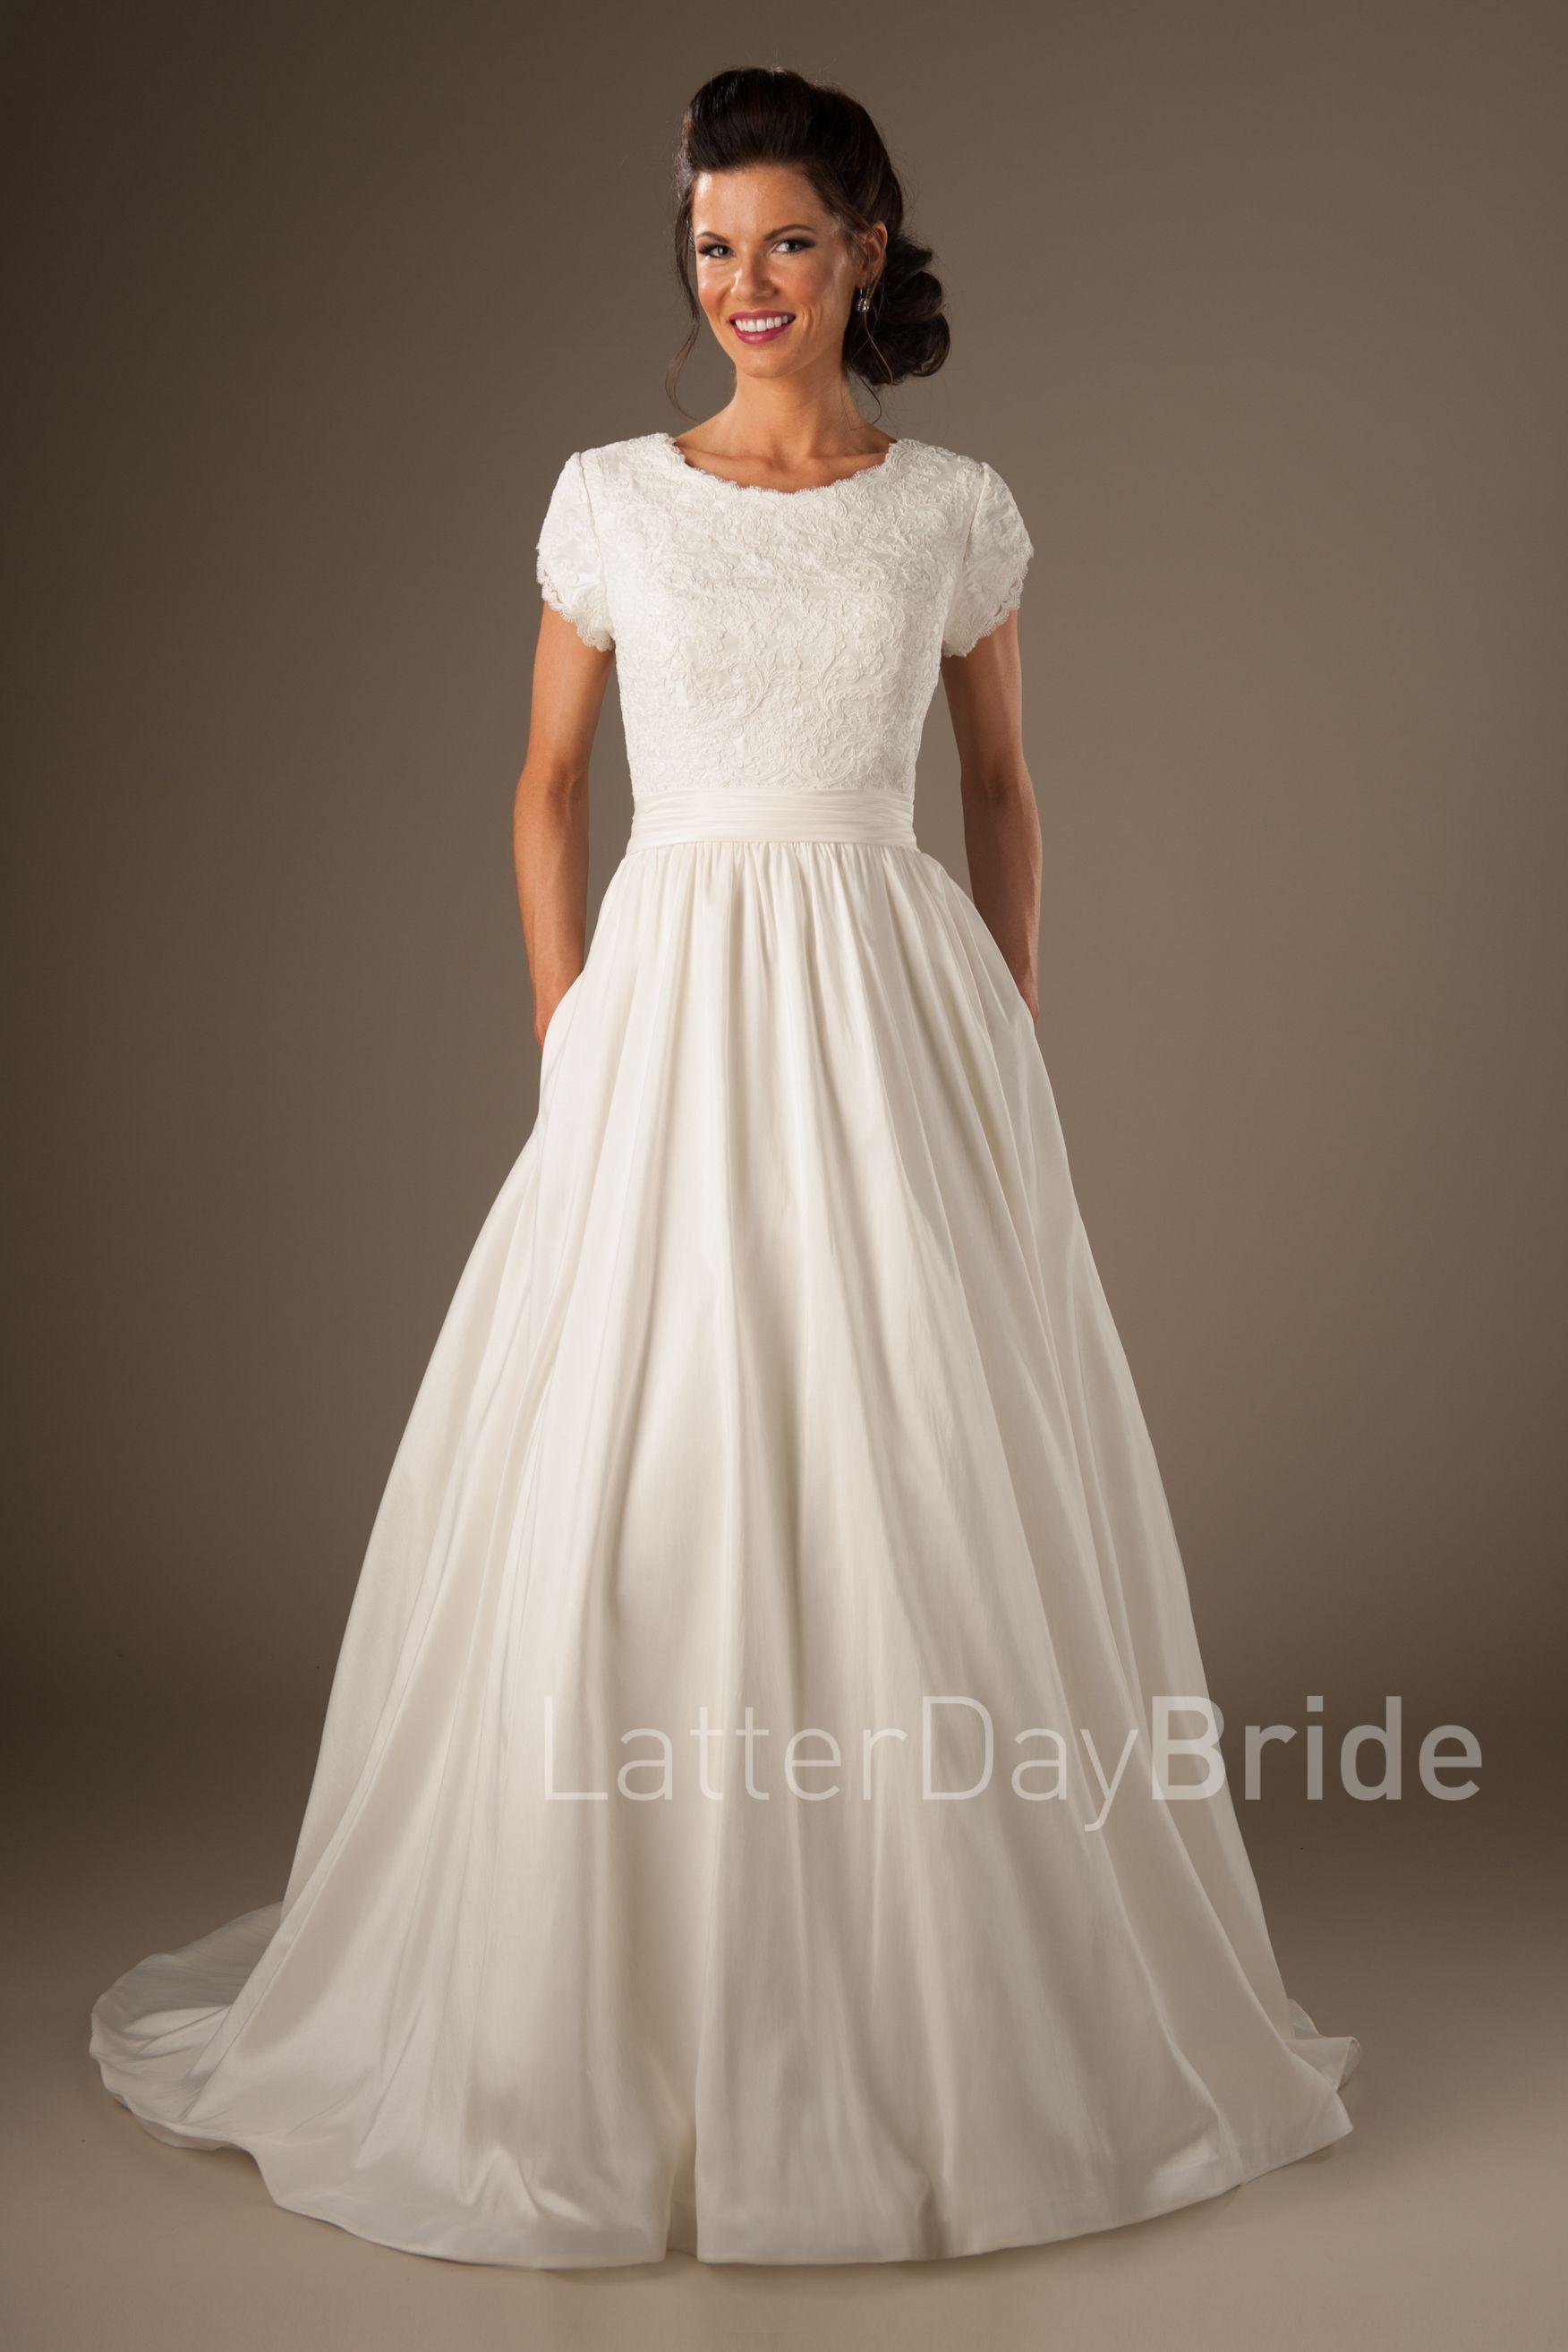 A Modest Wedding Dress For The Perfect Bride Wedding Dress Cap